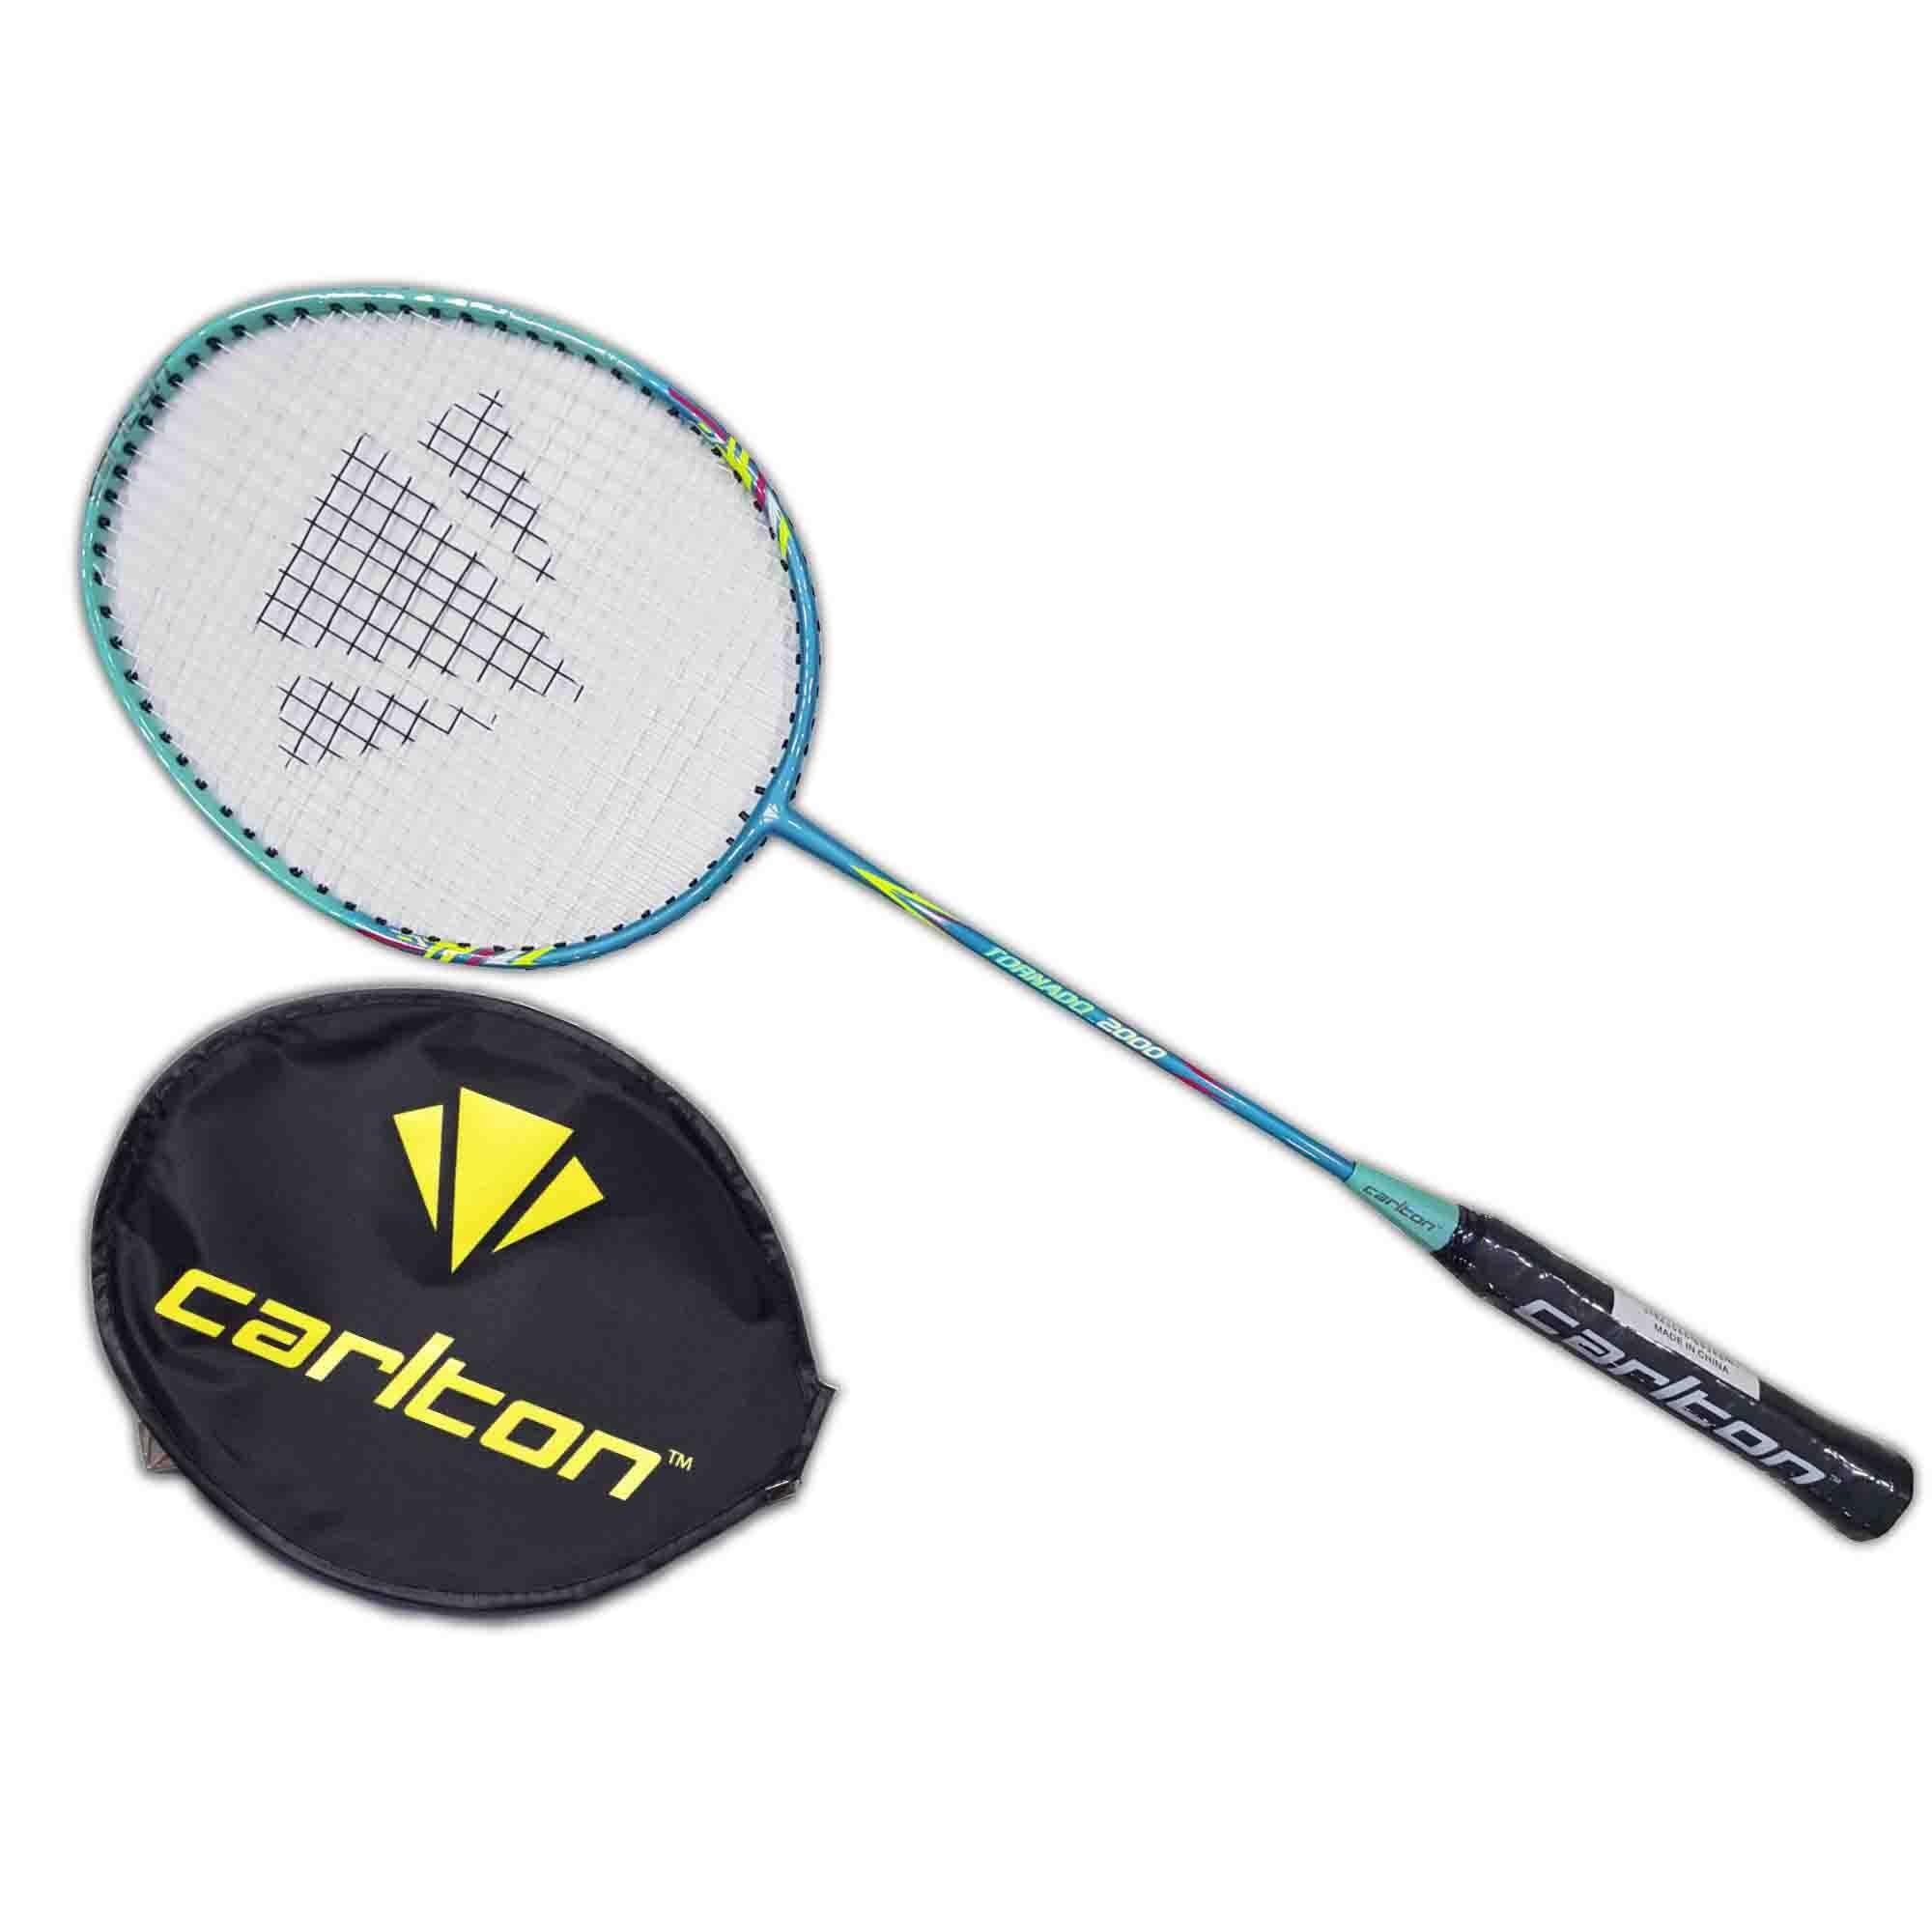 Carlton Badminton Racket Tornado 2000